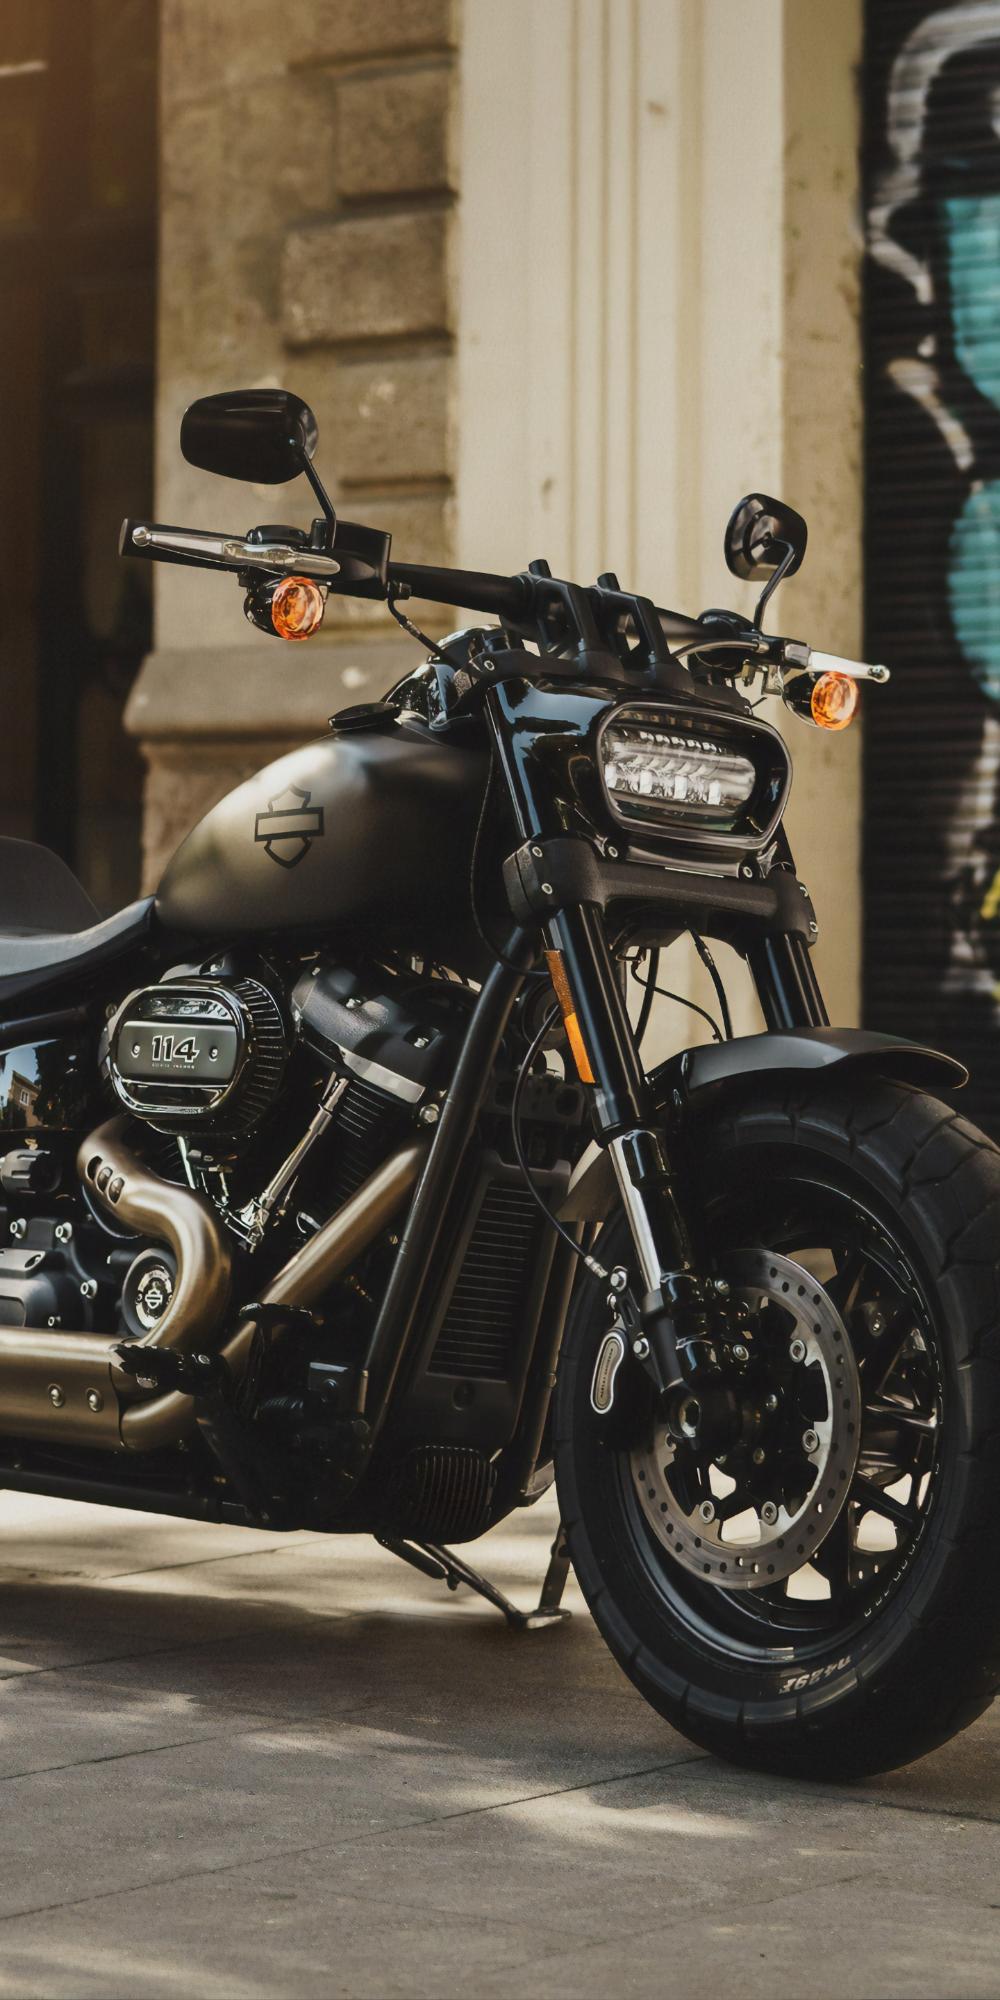 1440x2880 2019 Harley Davidson Motorcycle Wallpaper Motorcycle Wallpaper Harley Davidson Harley Davidson Wallpaper